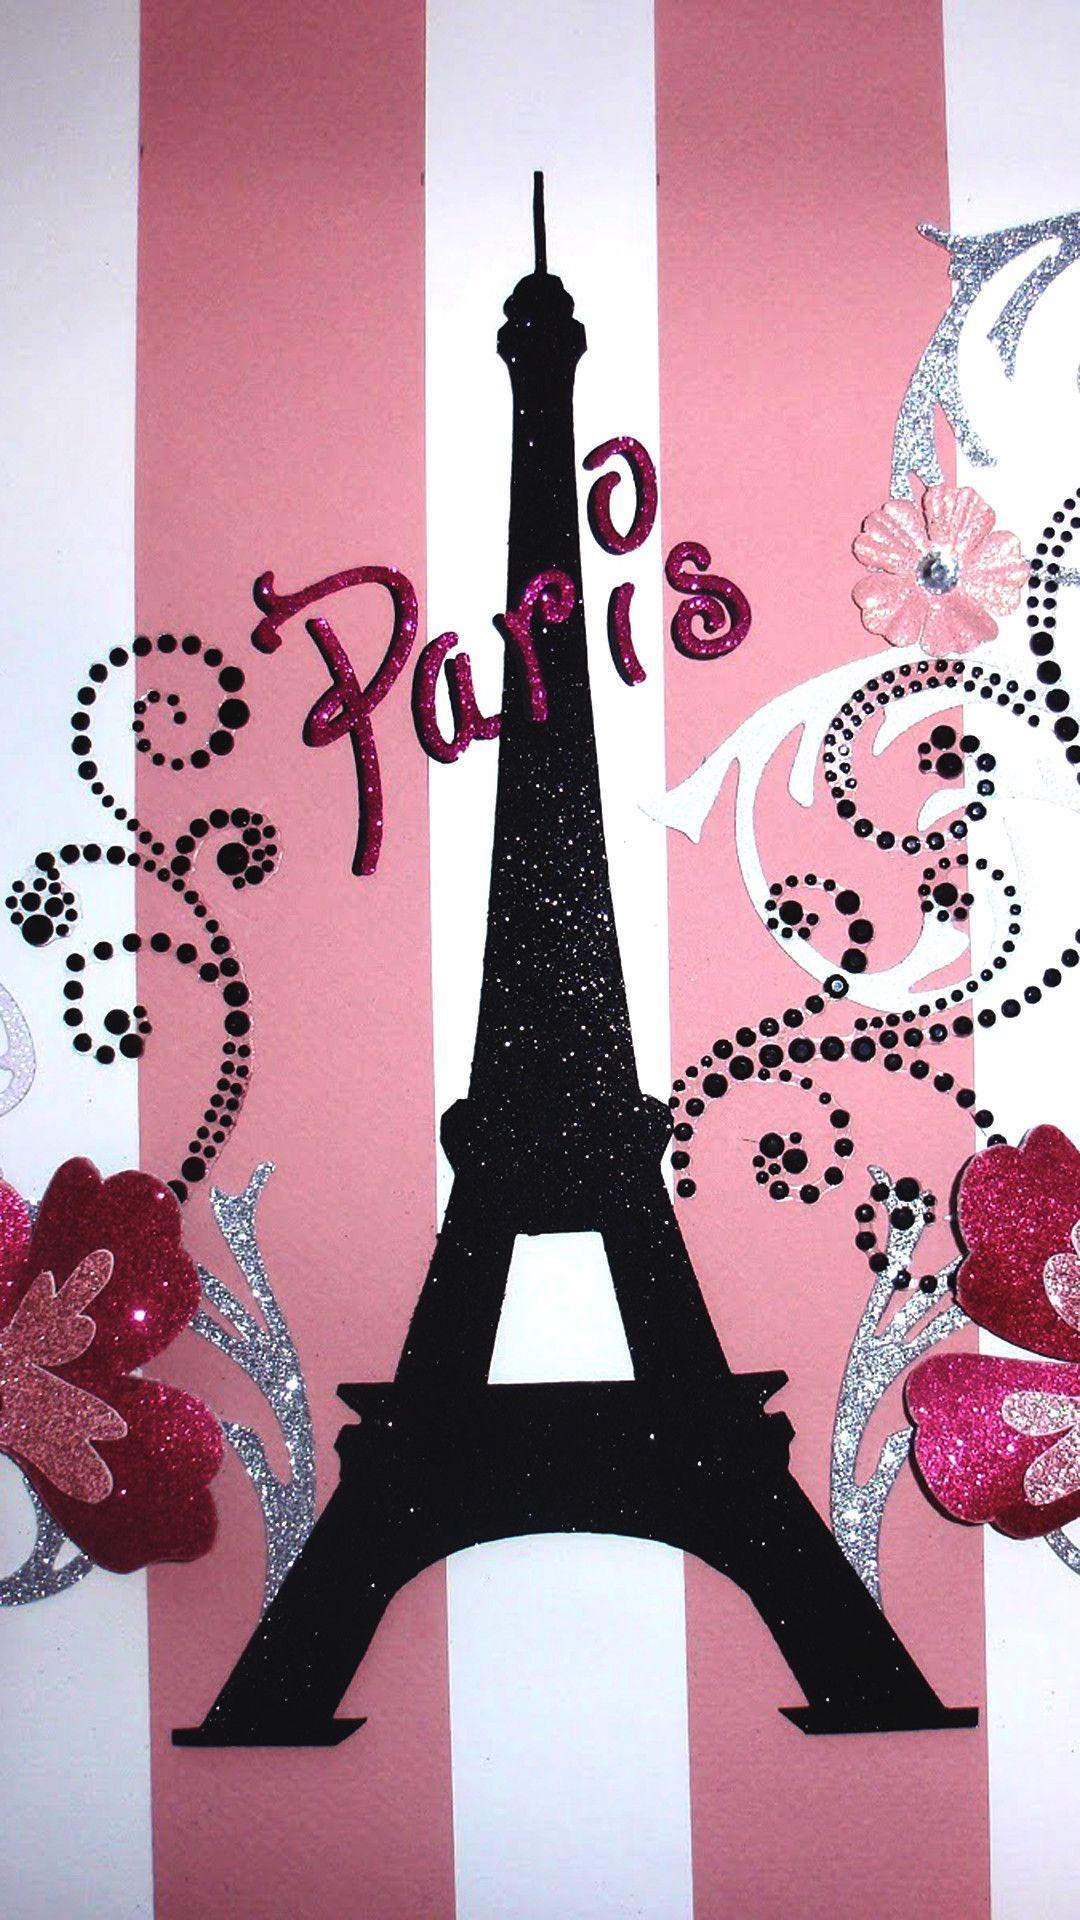 Pink Paris Iphone Wallpapers Top Free Pink Paris Iphone